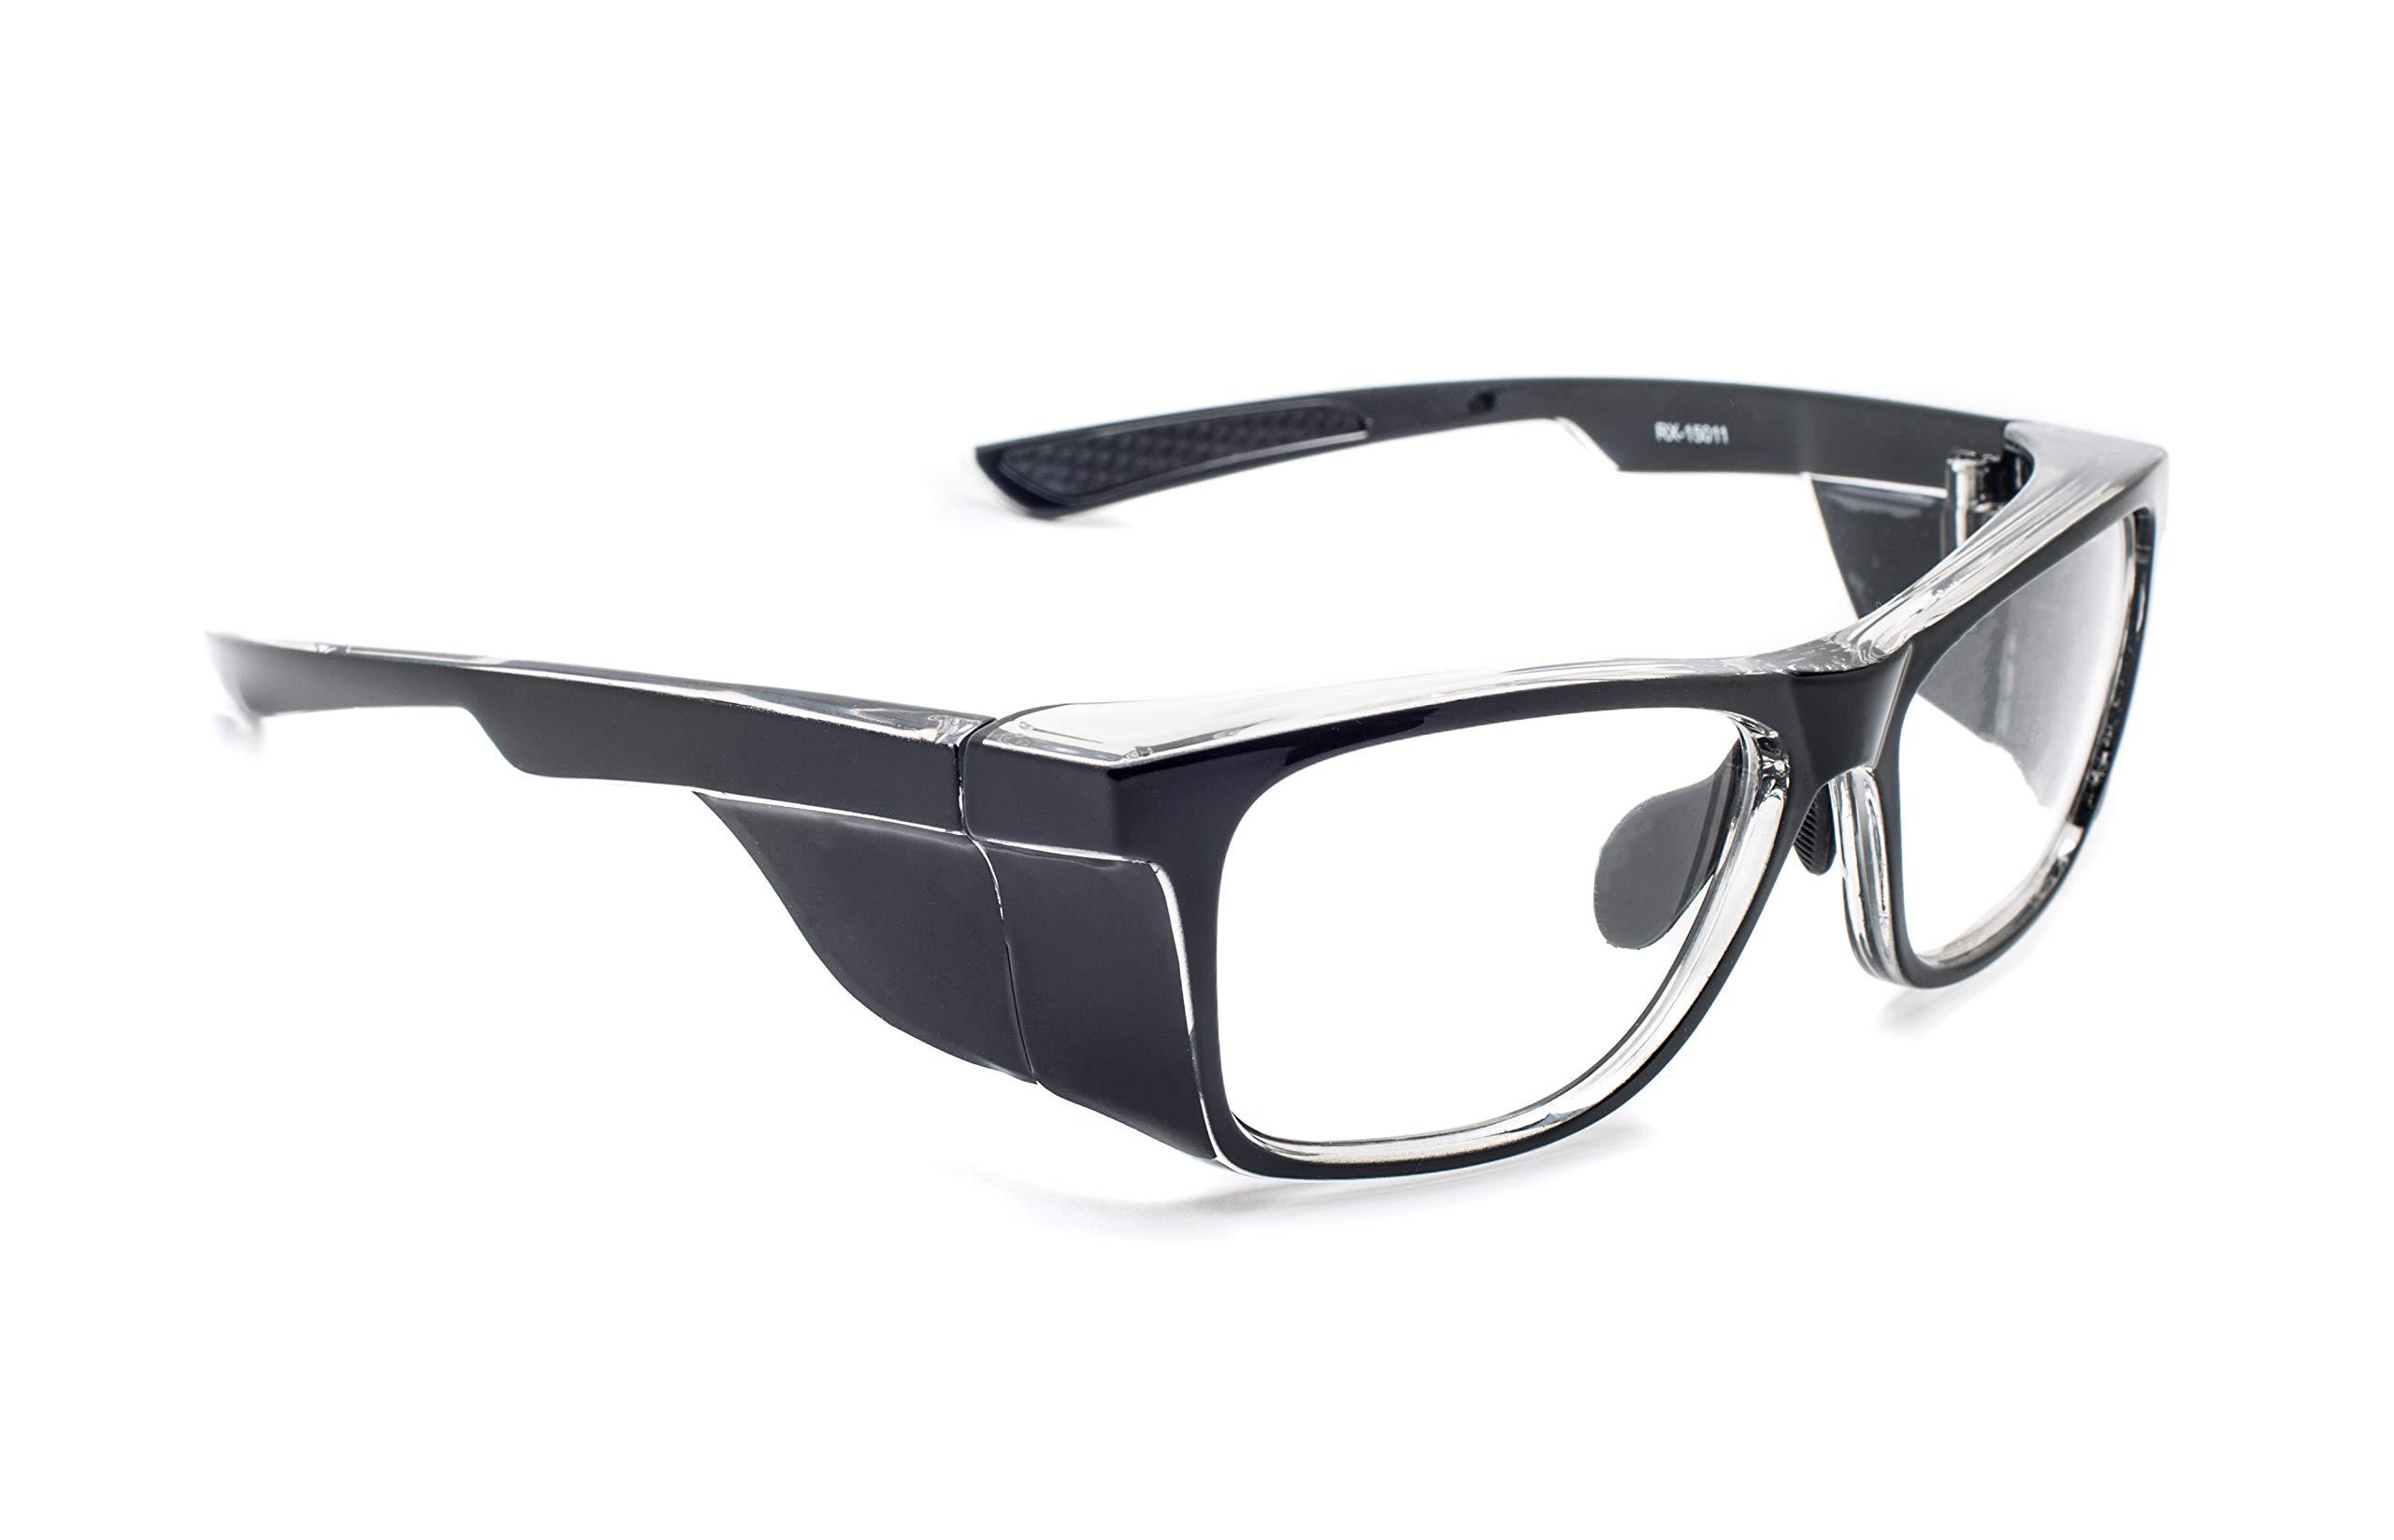 Leaded Glasses Radiation Safety Eyewear RG-15011-BK